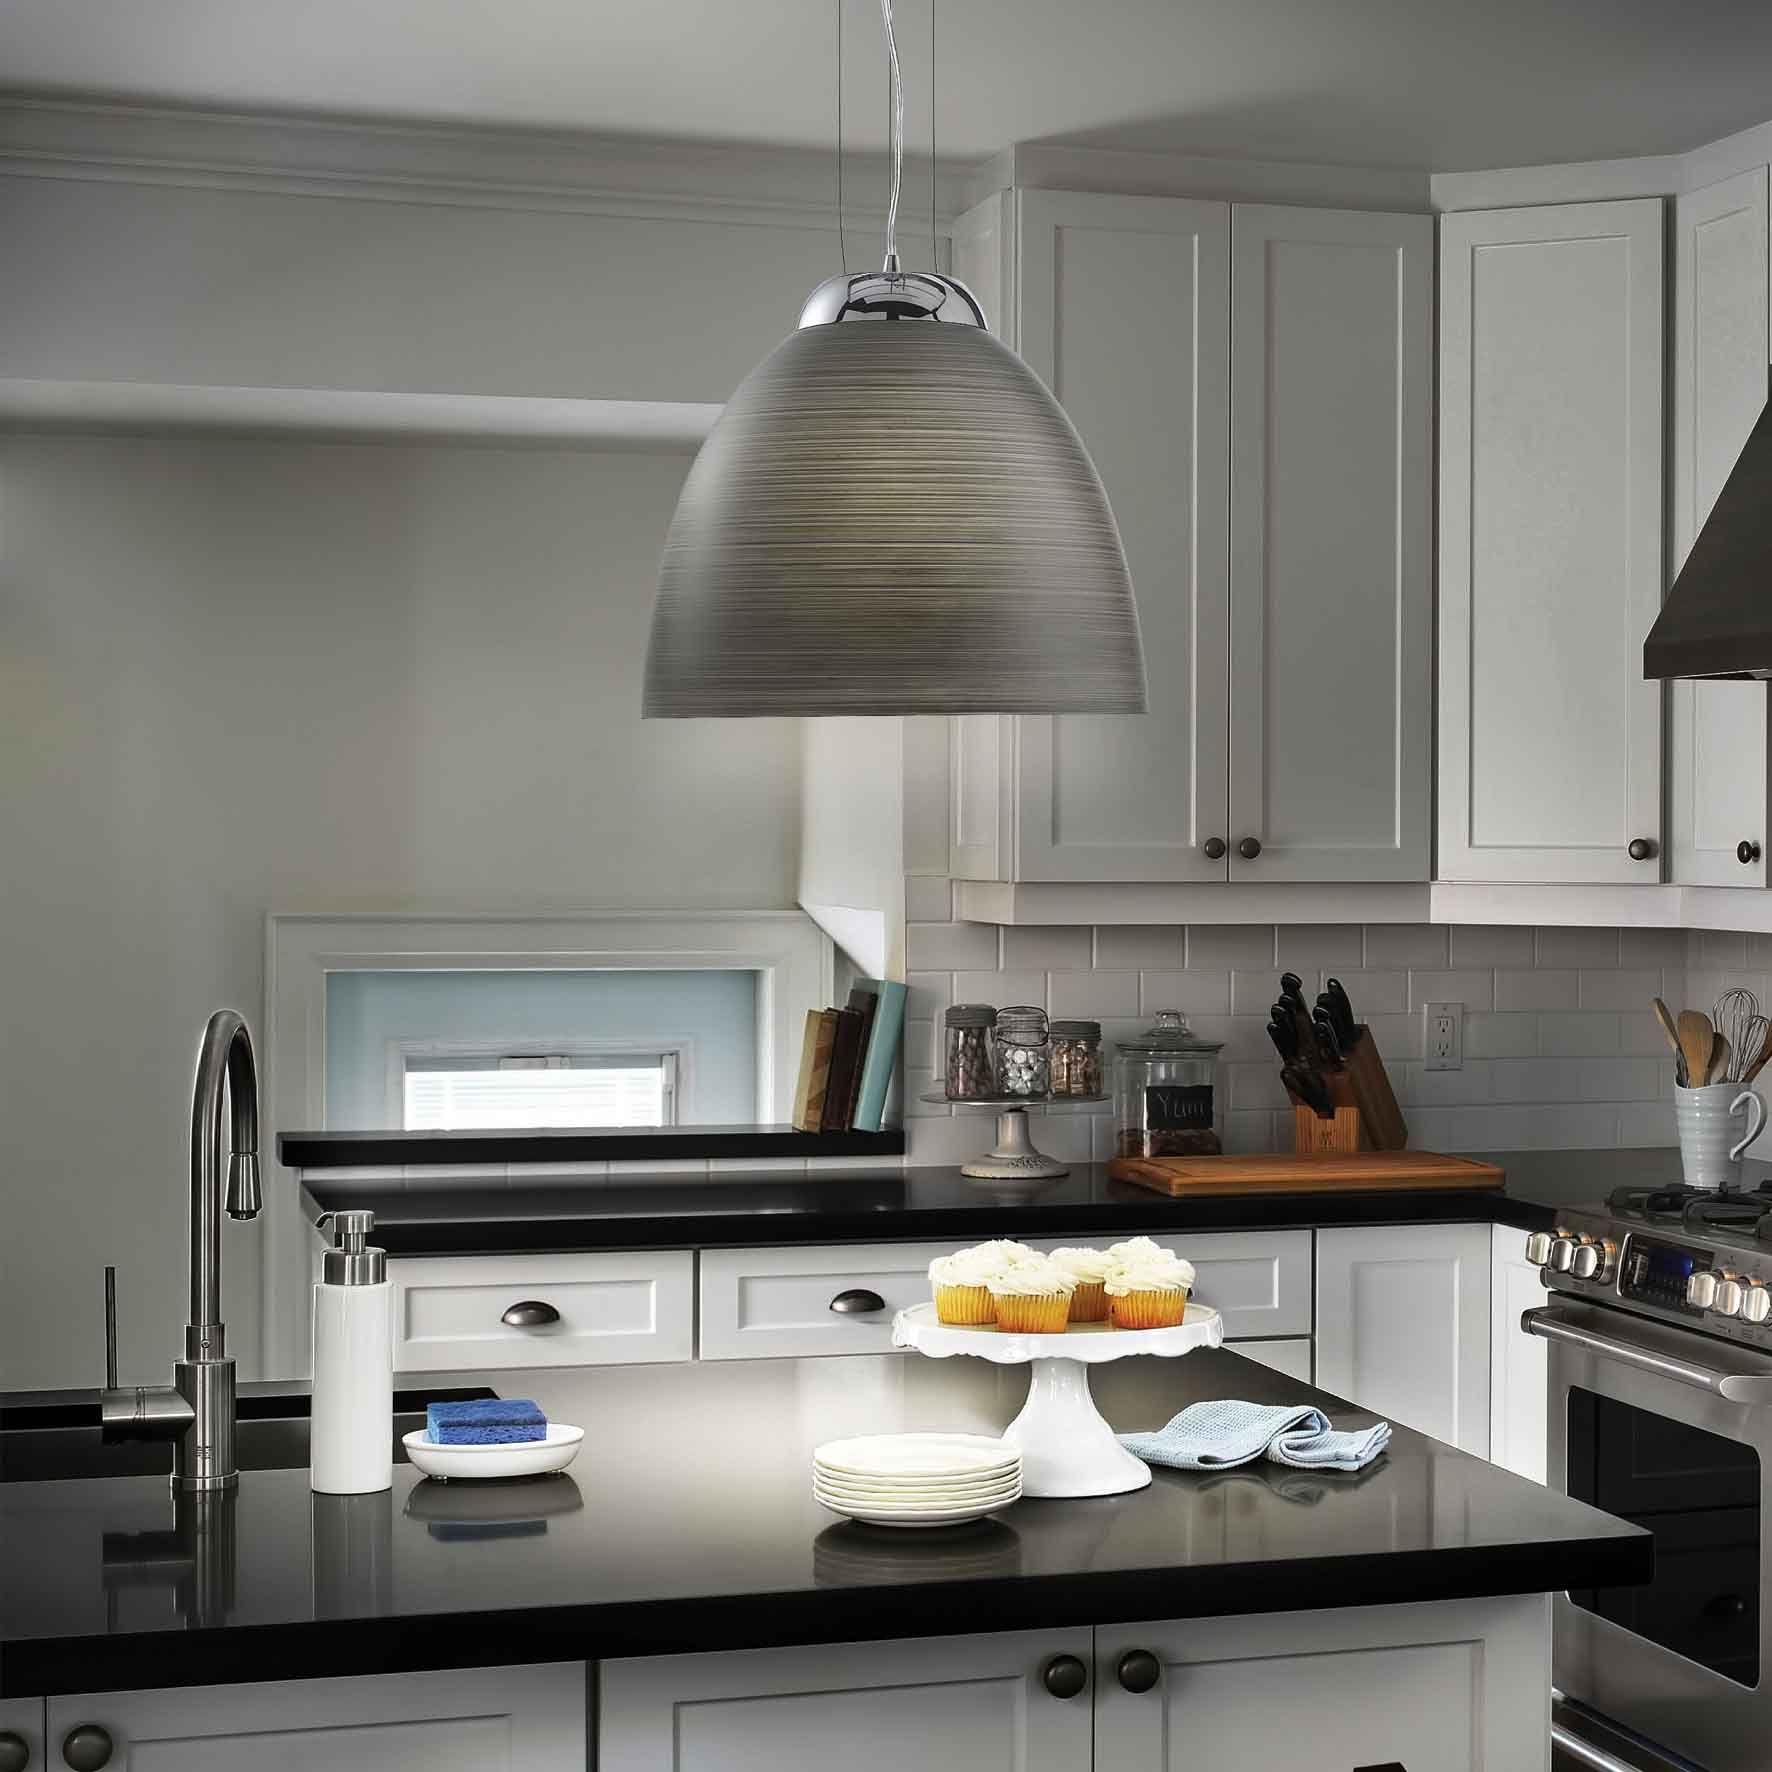 Illuminazione cucina: lampadari o sospensioni?